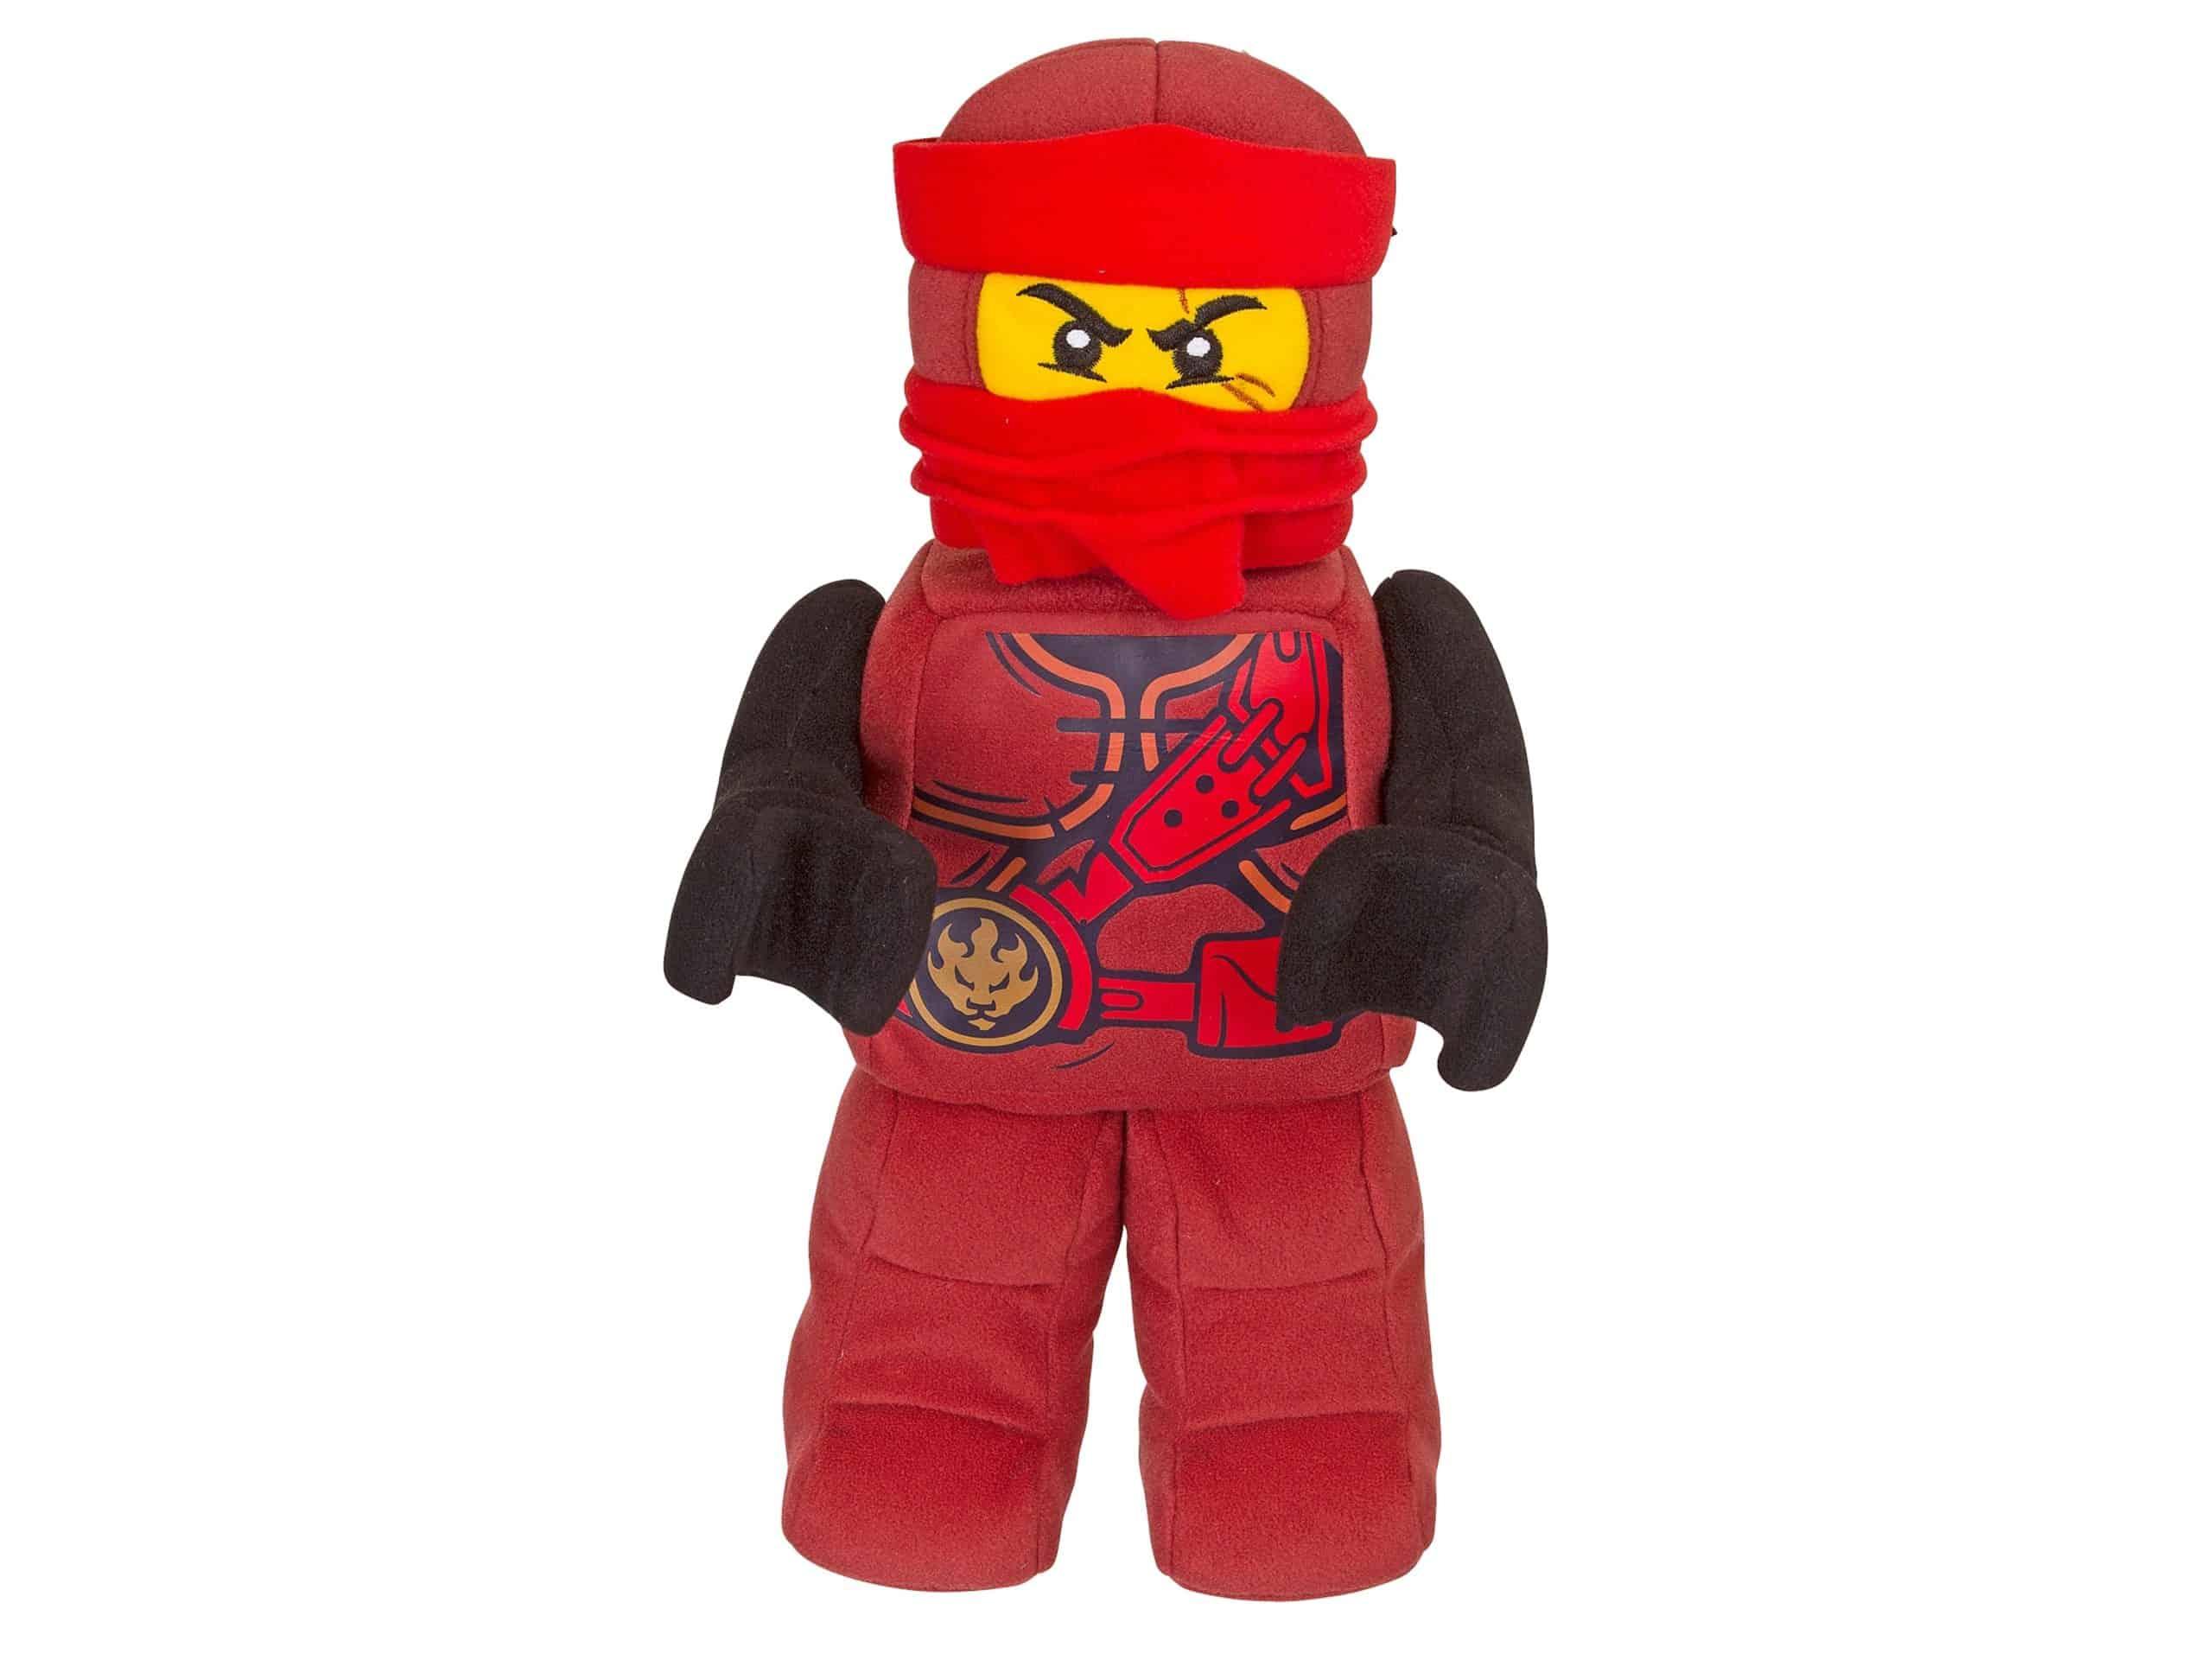 lego 853691 ninjago kai plysminifigur scaled